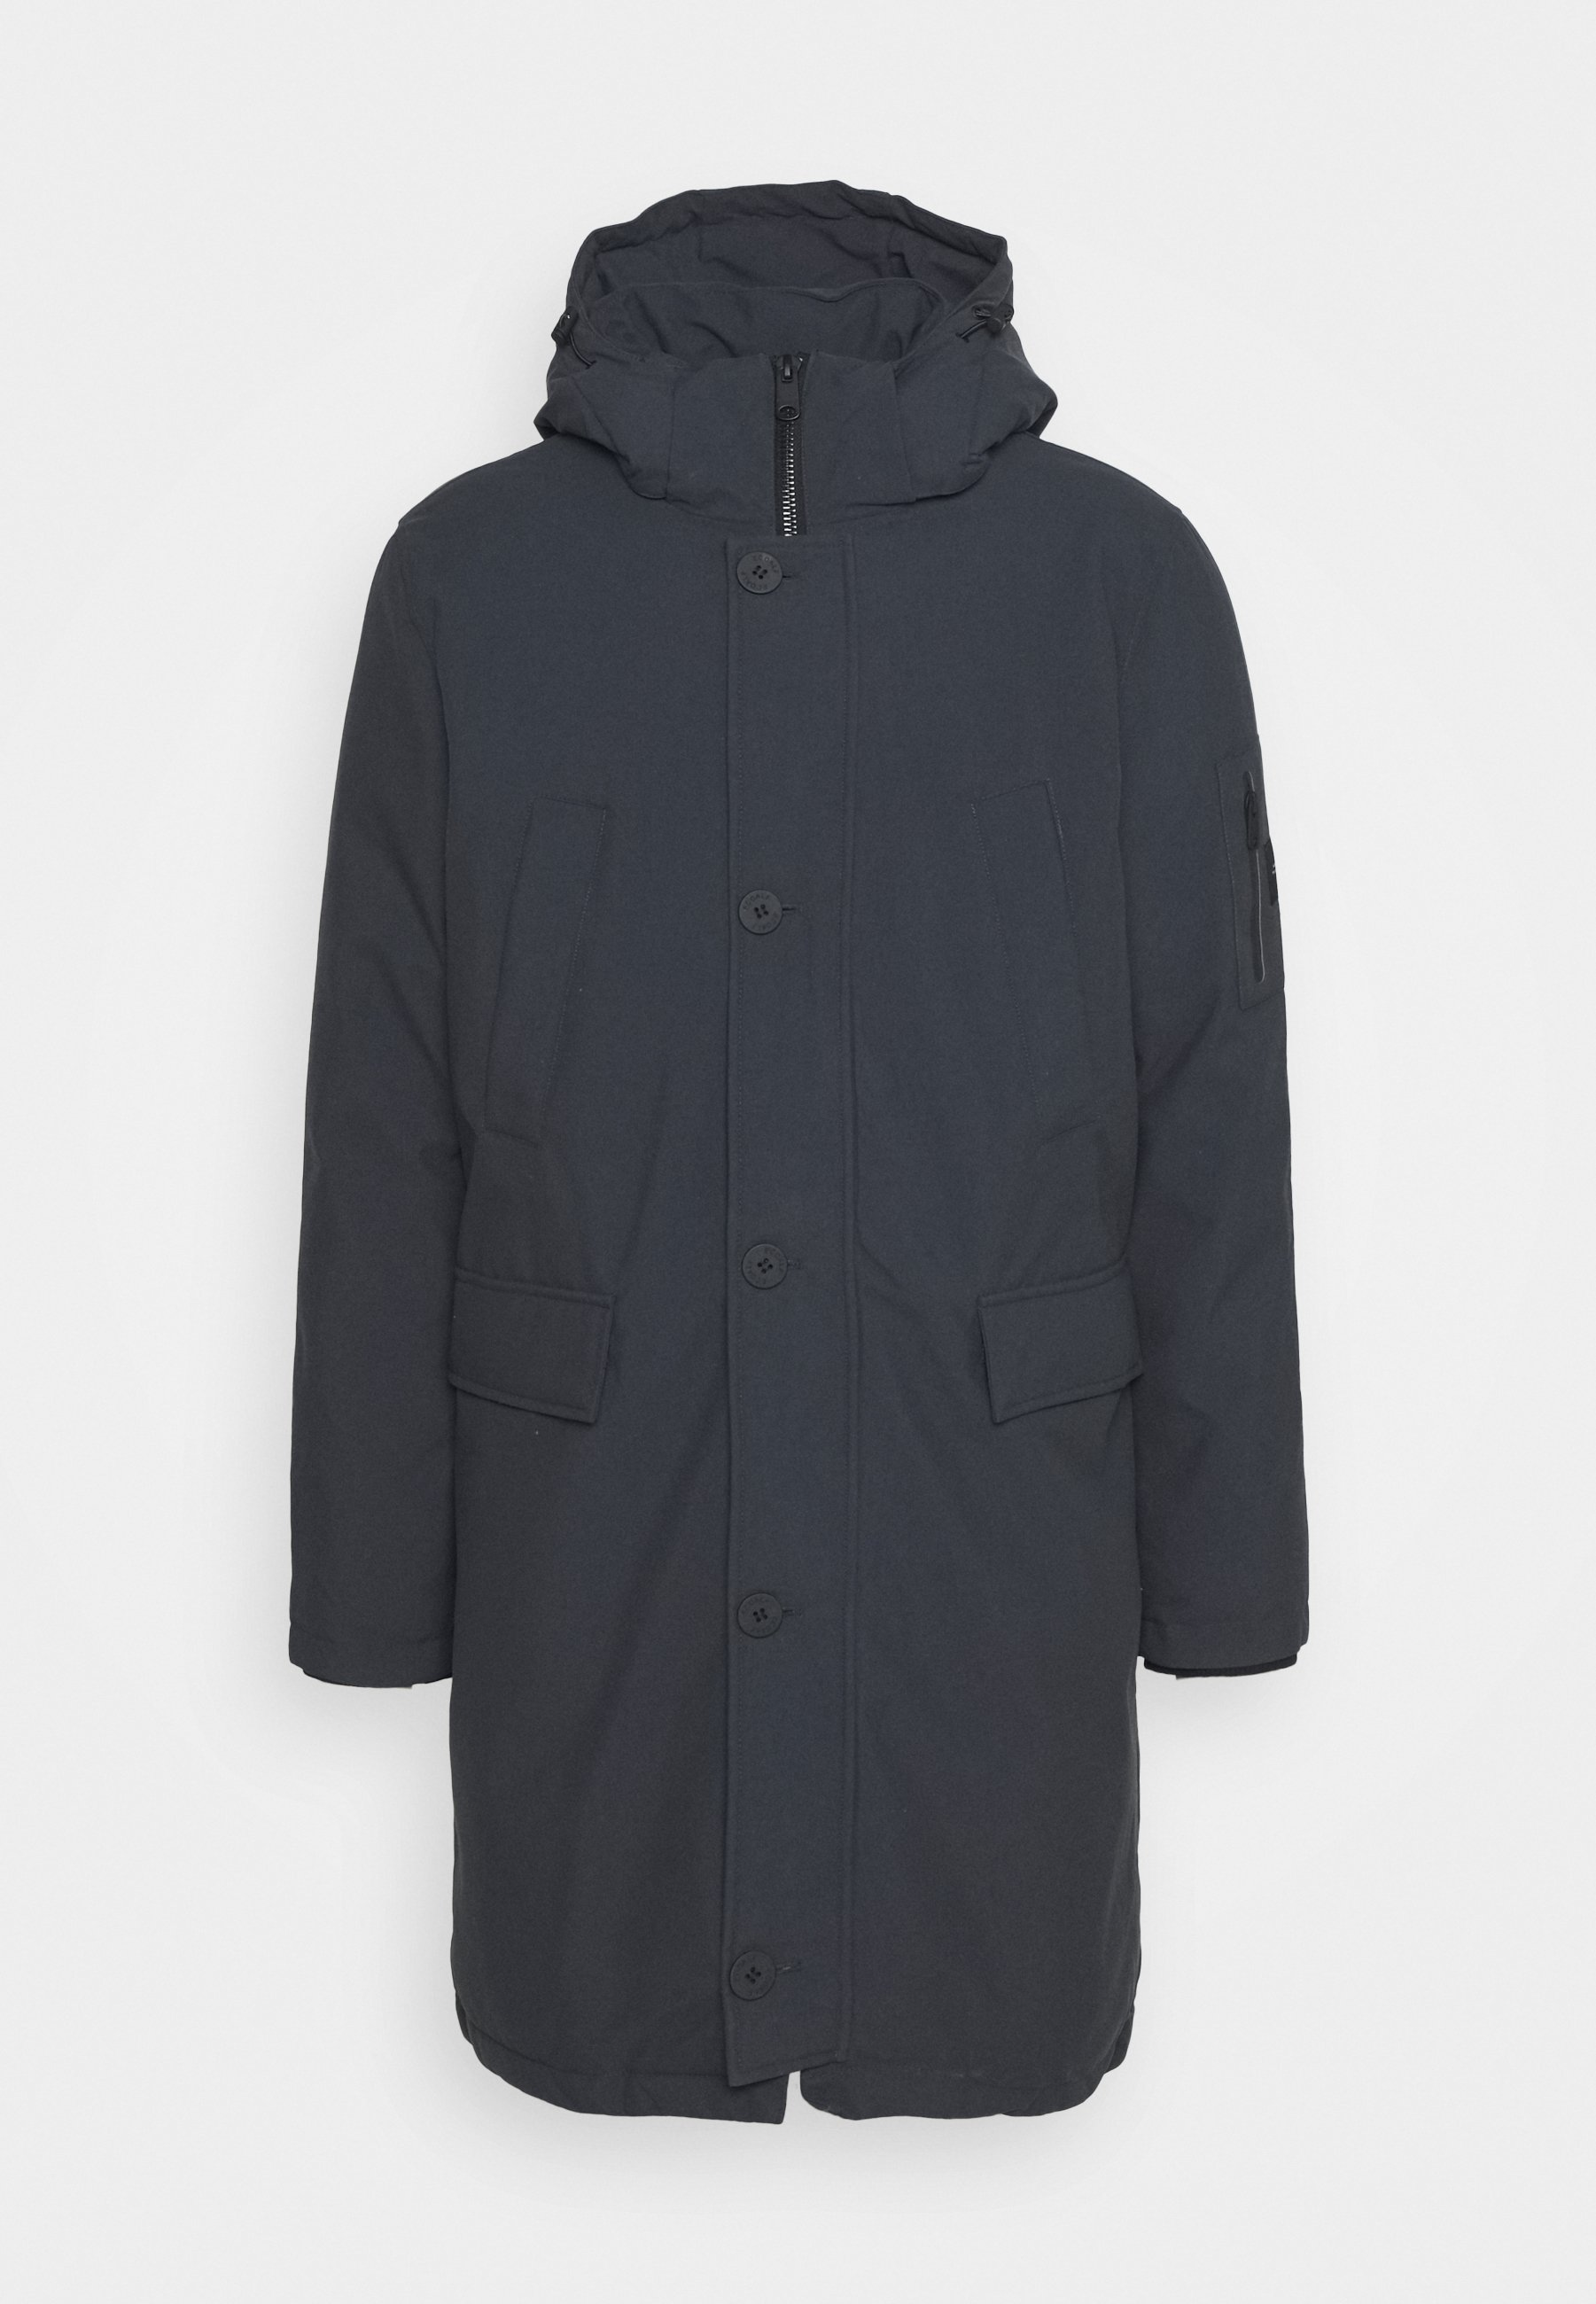 Homme GROENLAND COAT MAN - Veste d'hiver